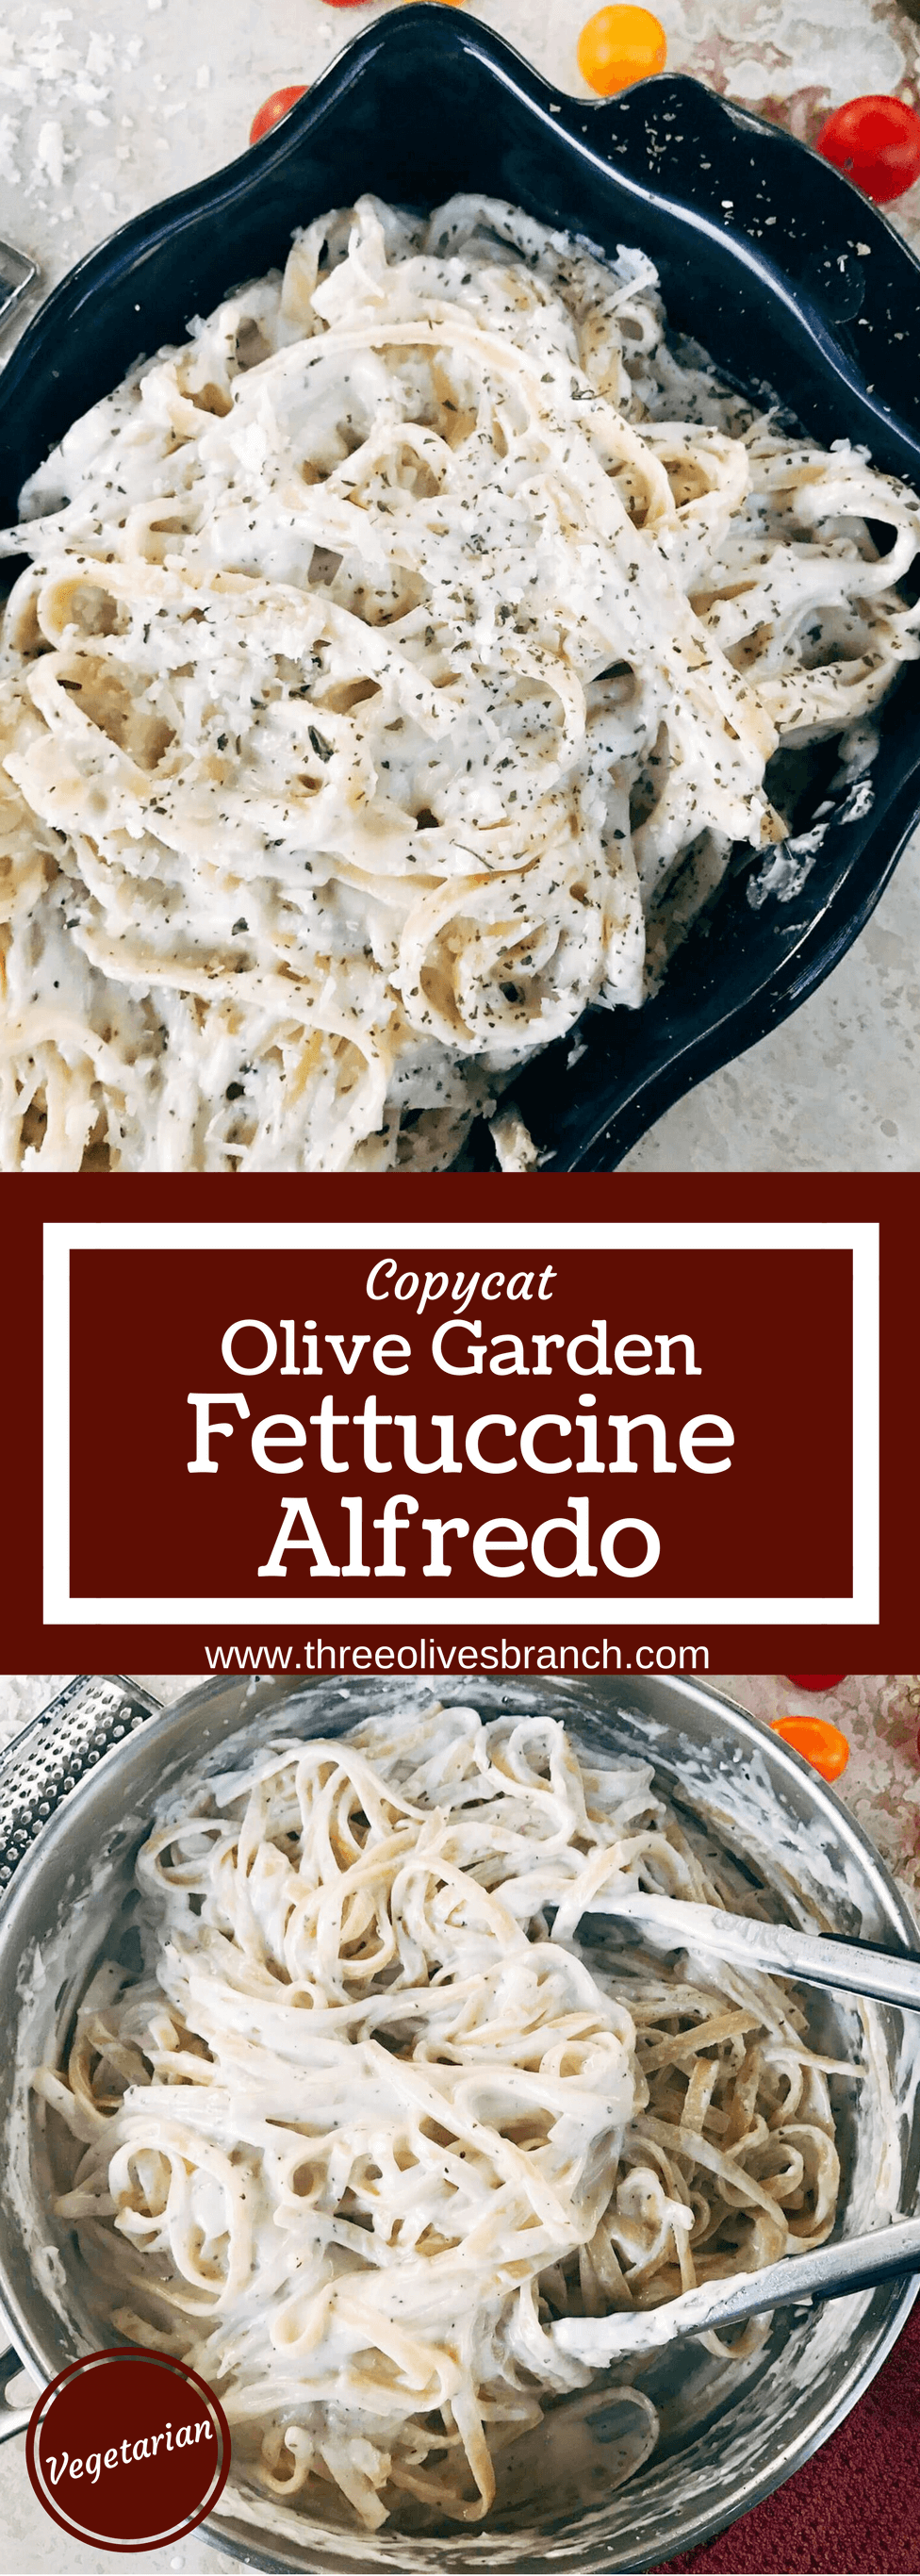 Copycat Olive Garden Fettuccine Alfredo Recipe Food